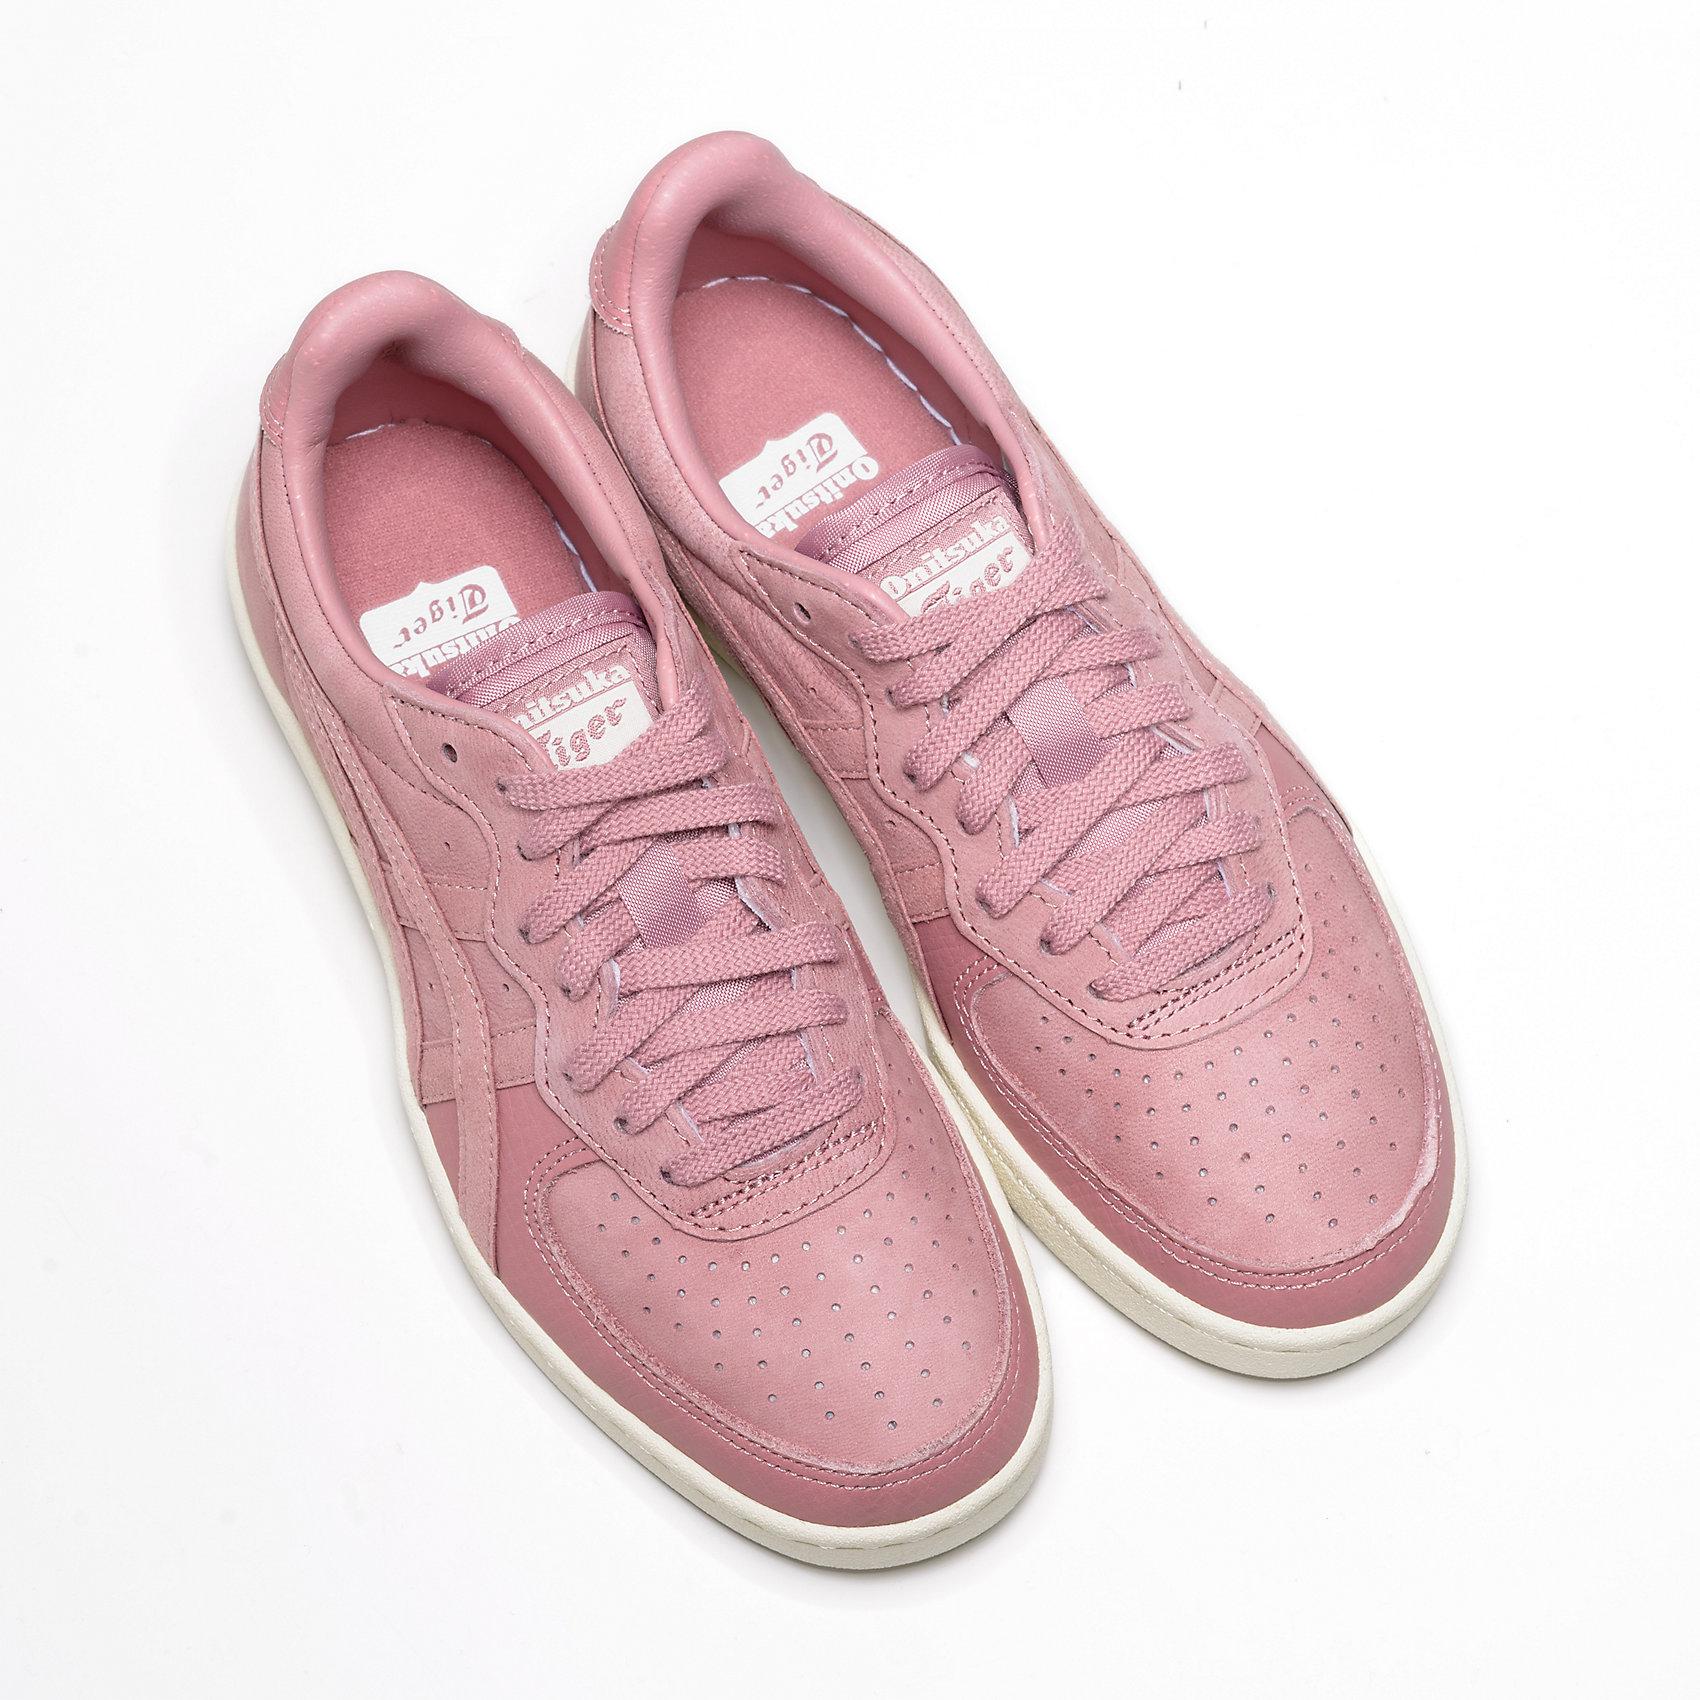 Neu Onitsuka Damen Tiger® GSM Sneakers Niedrig 7288523 für Damen Onitsuka rosa ec4a7b